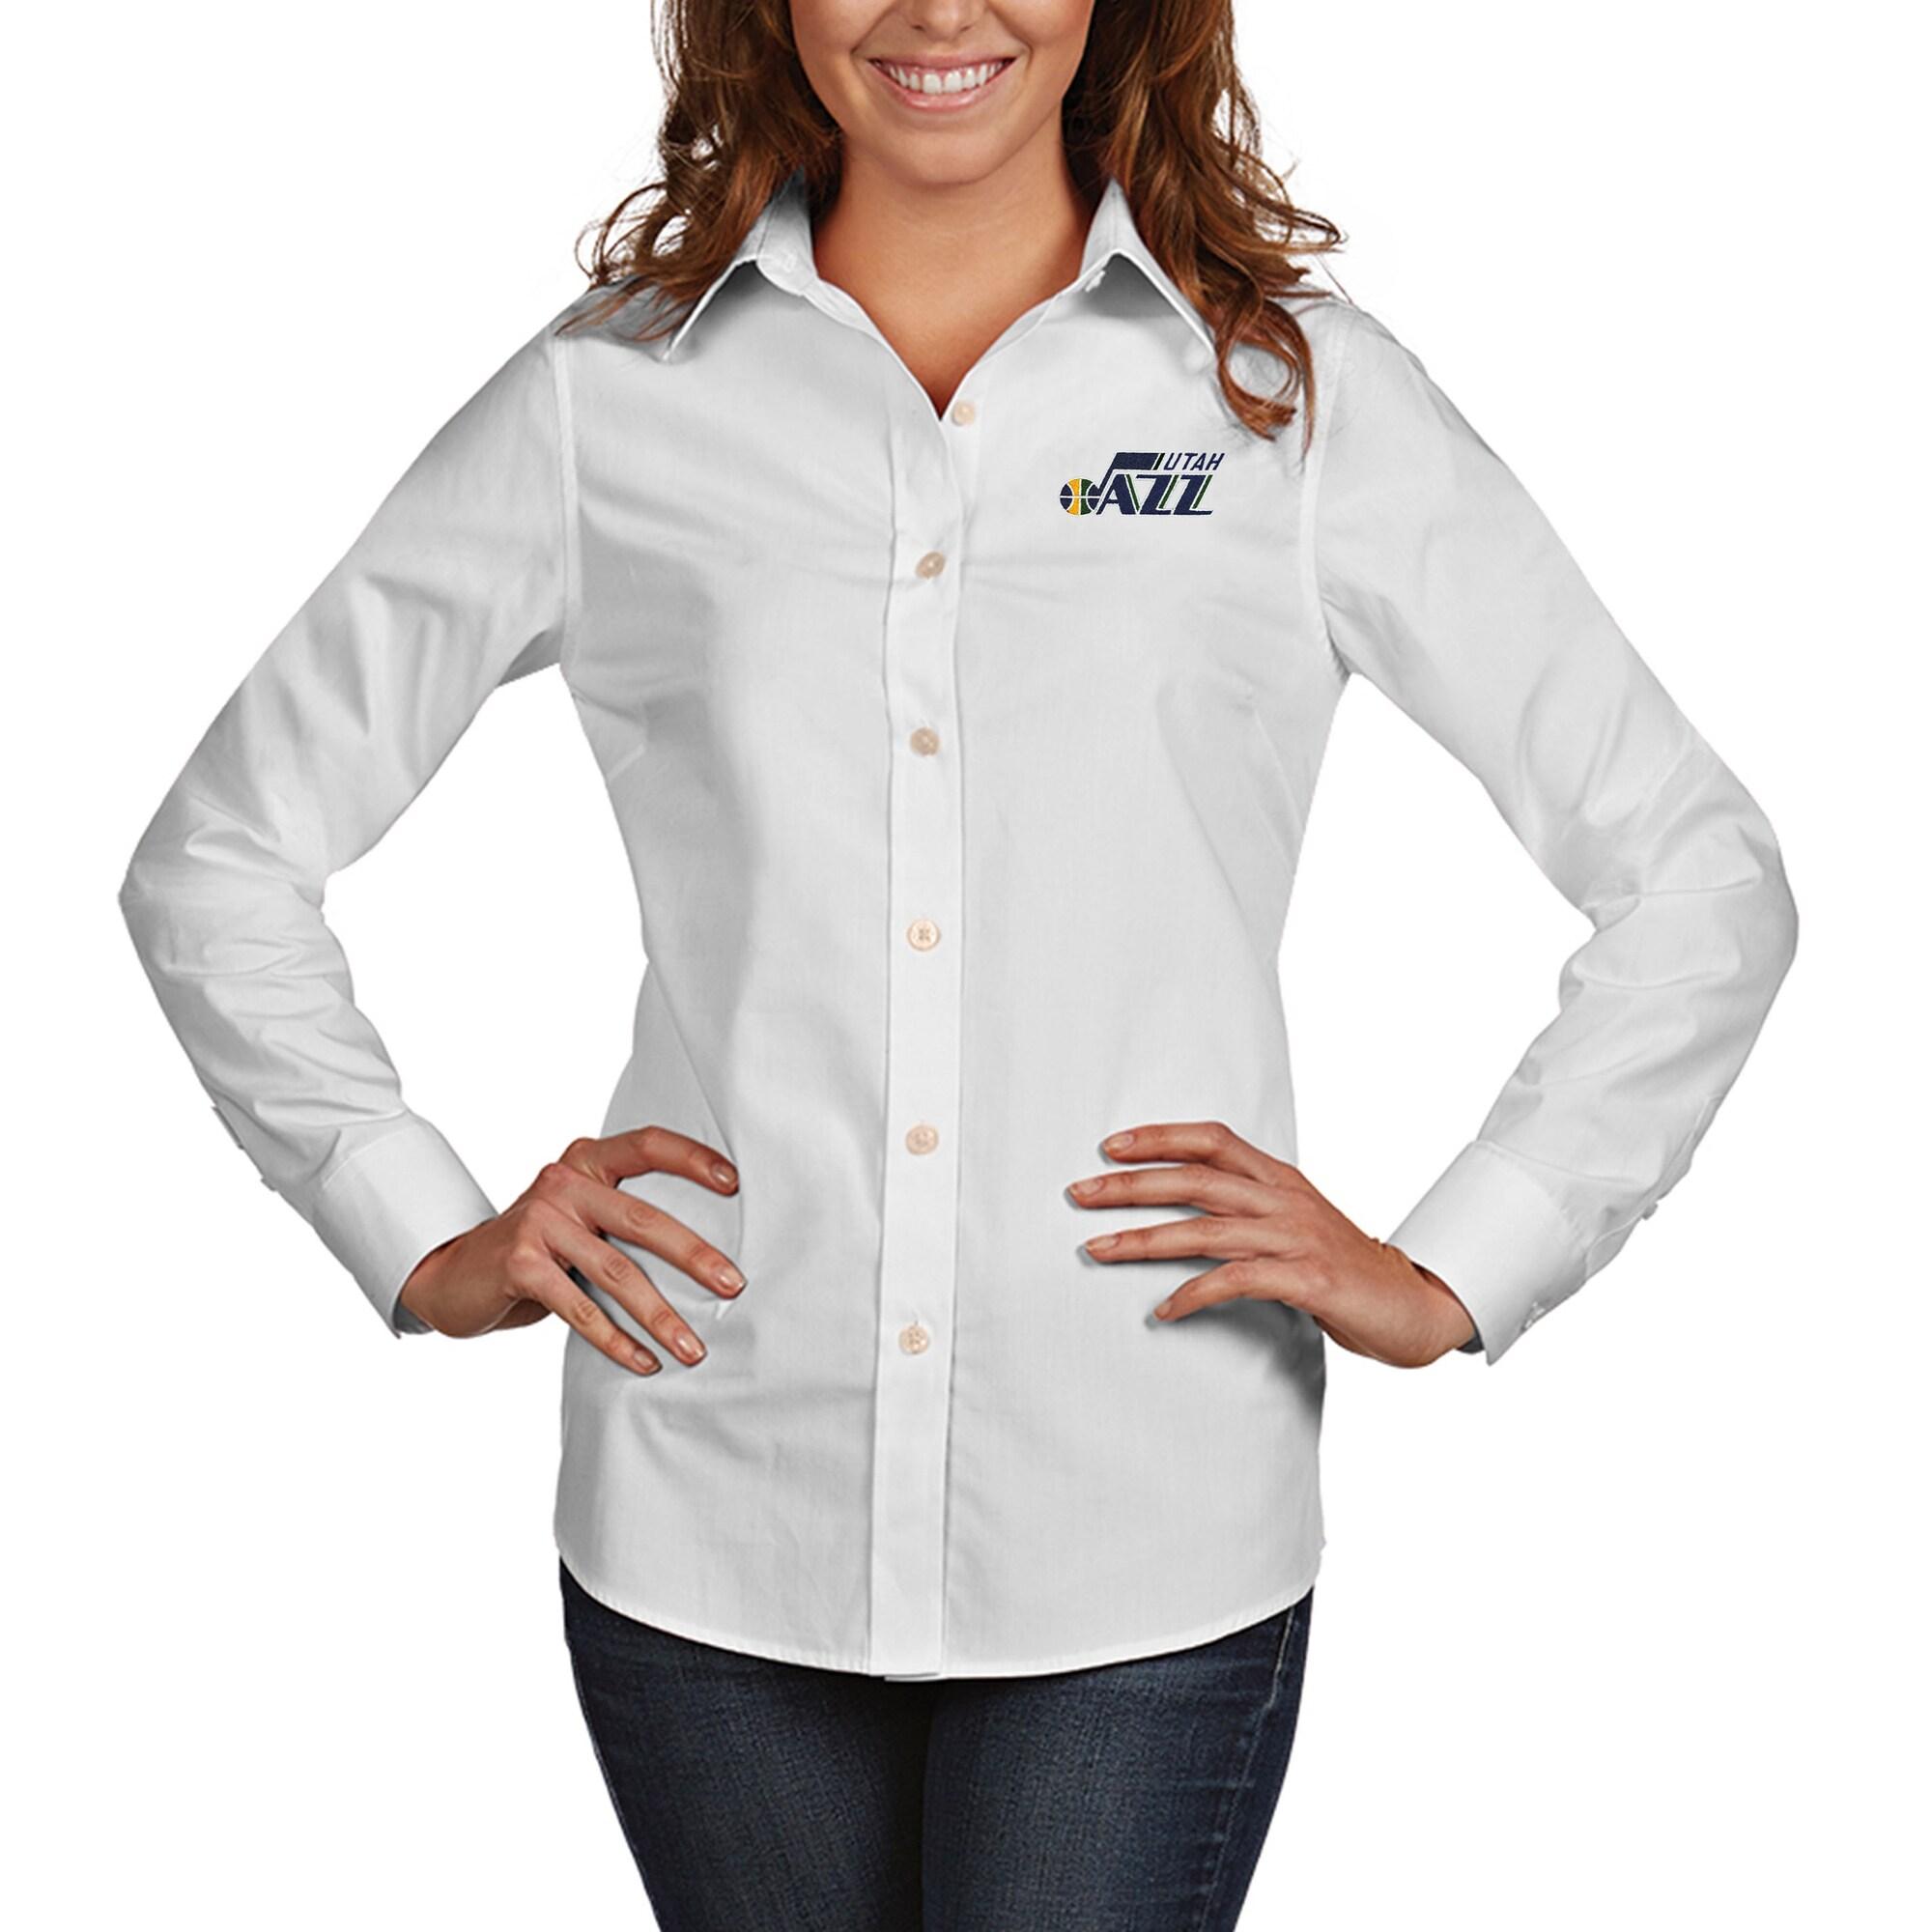 Utah Jazz Antigua Women's Dynasty Woven Button-Up Long Sleeve Shirt - White